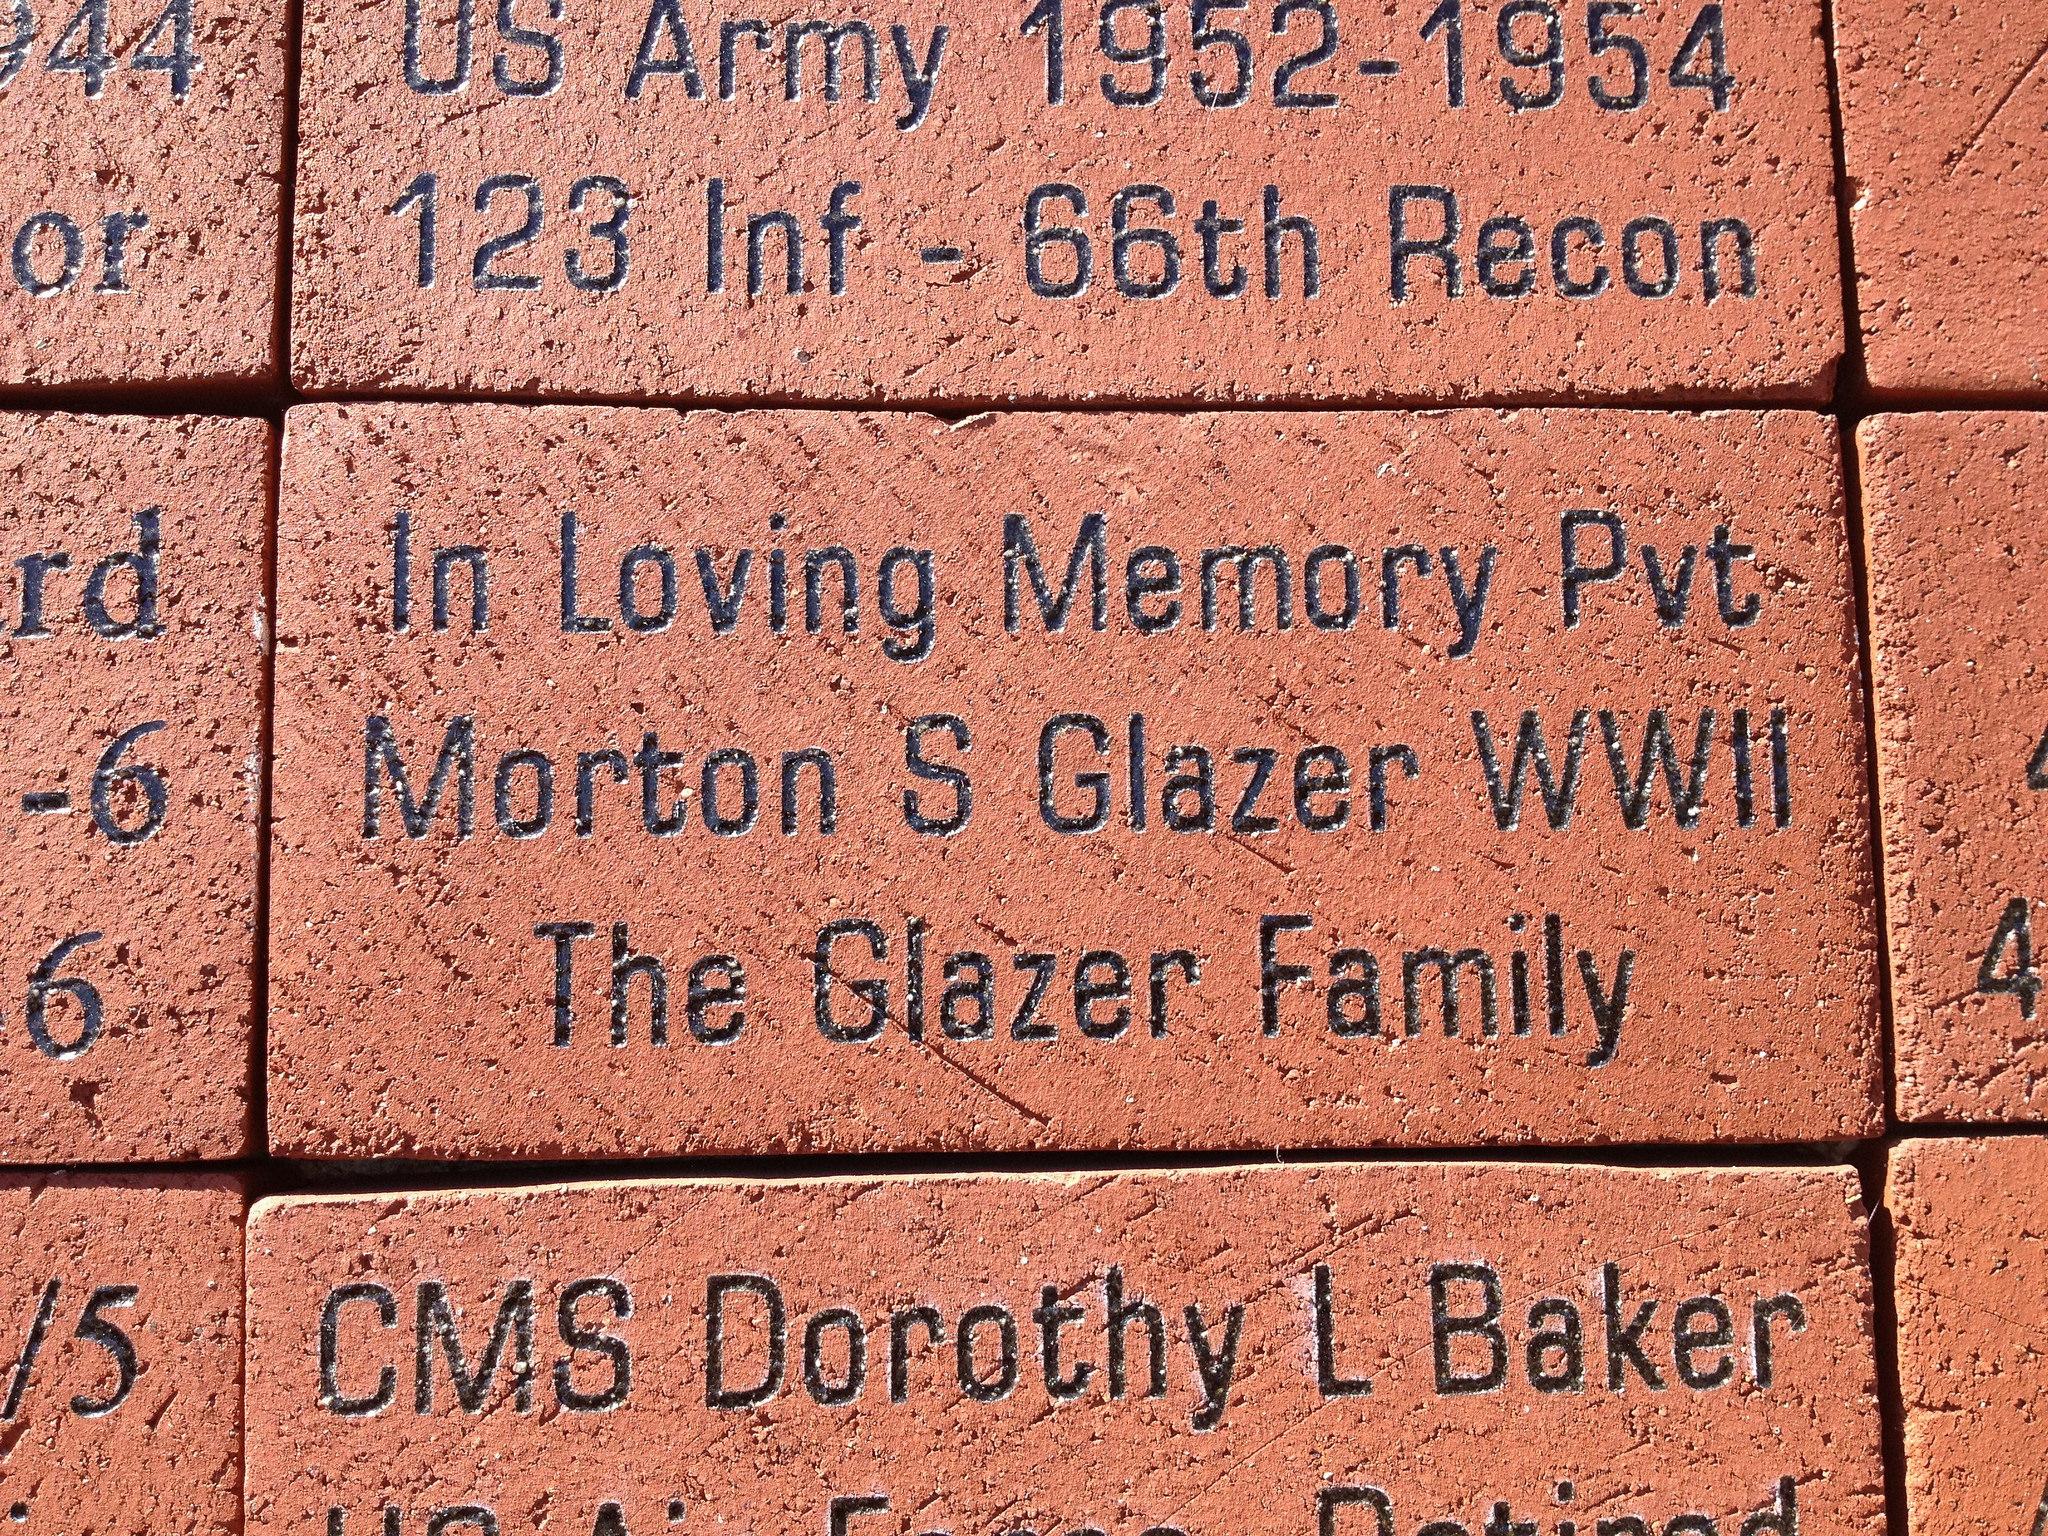 Mort_Glazer_memorial_stone.jpg